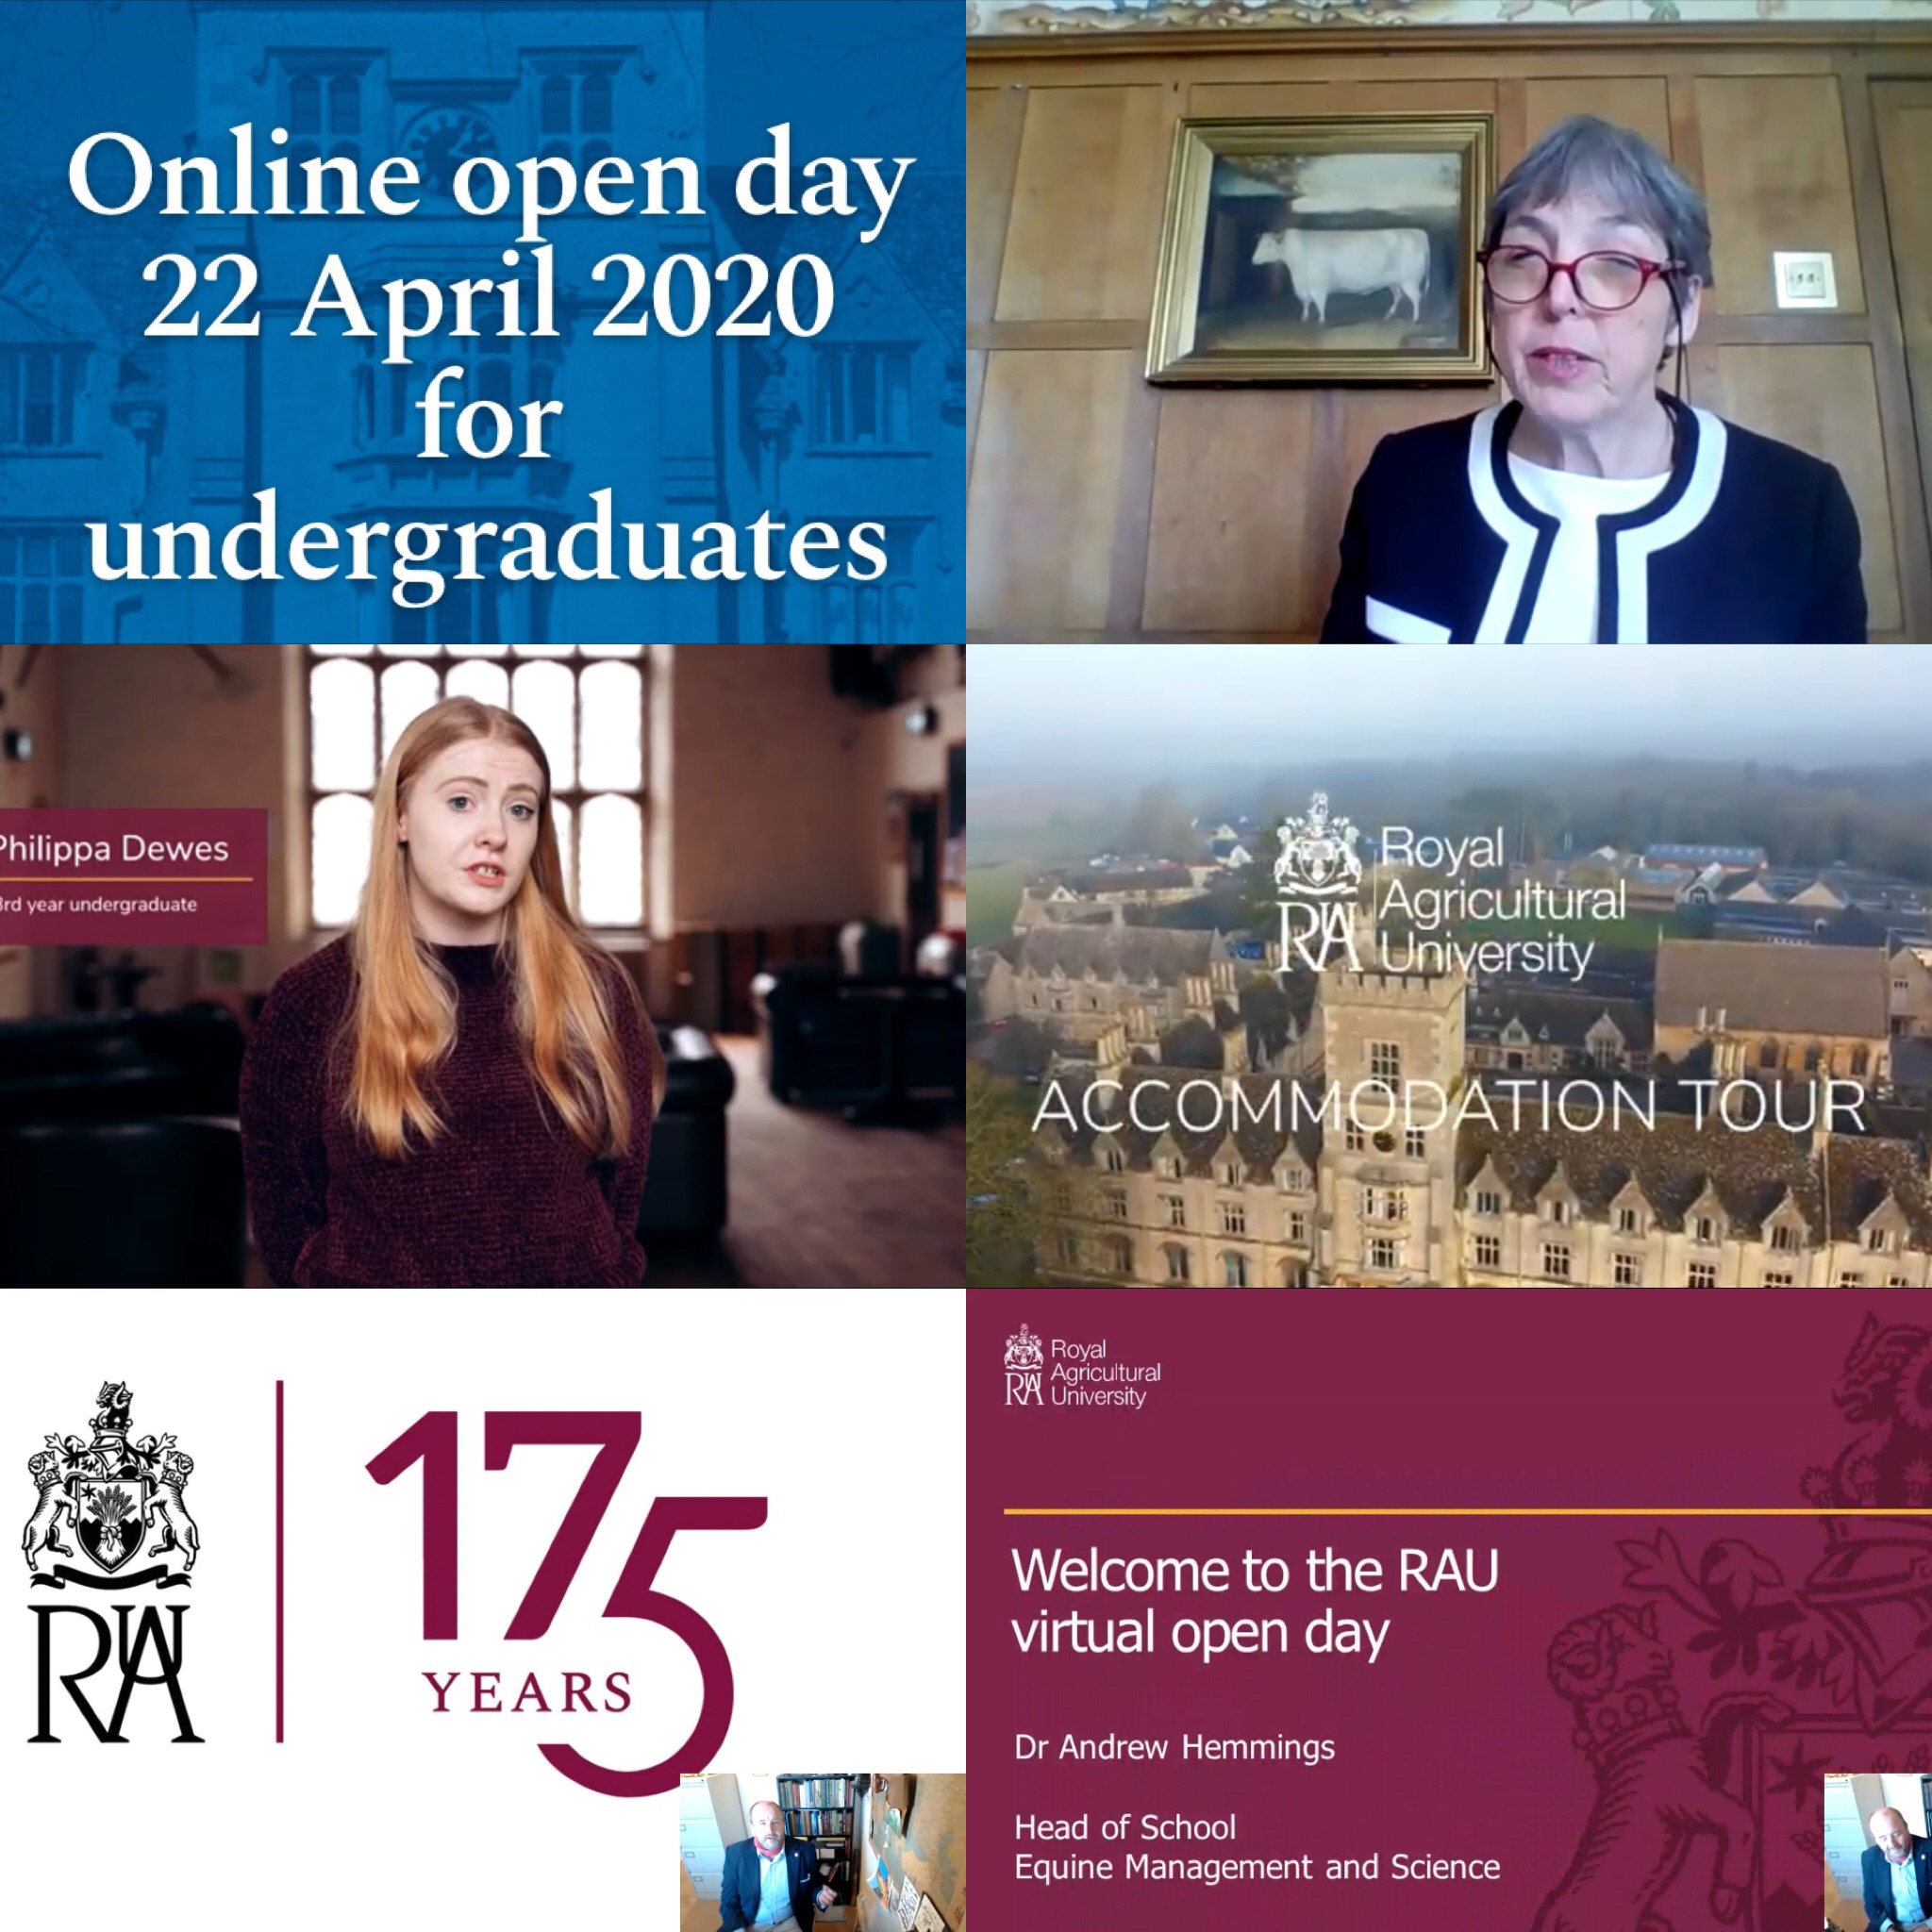 Online open day